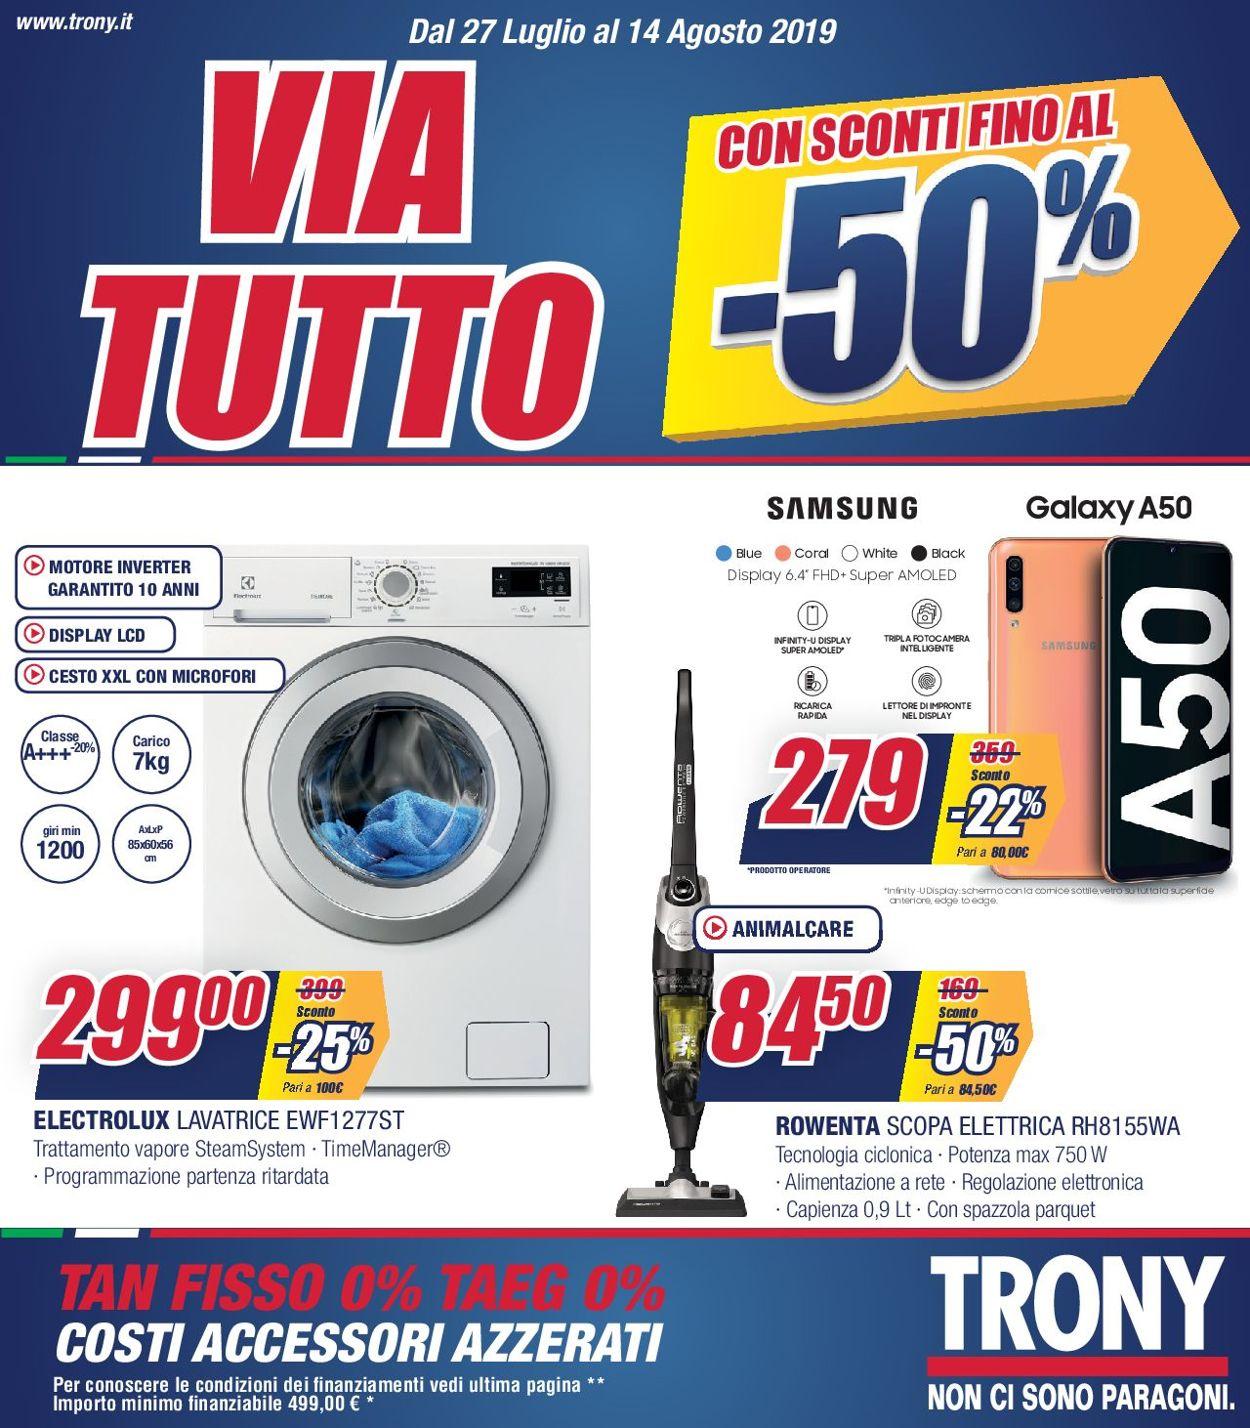 Volantino Trony - Offerte 27/07-14/08/2019